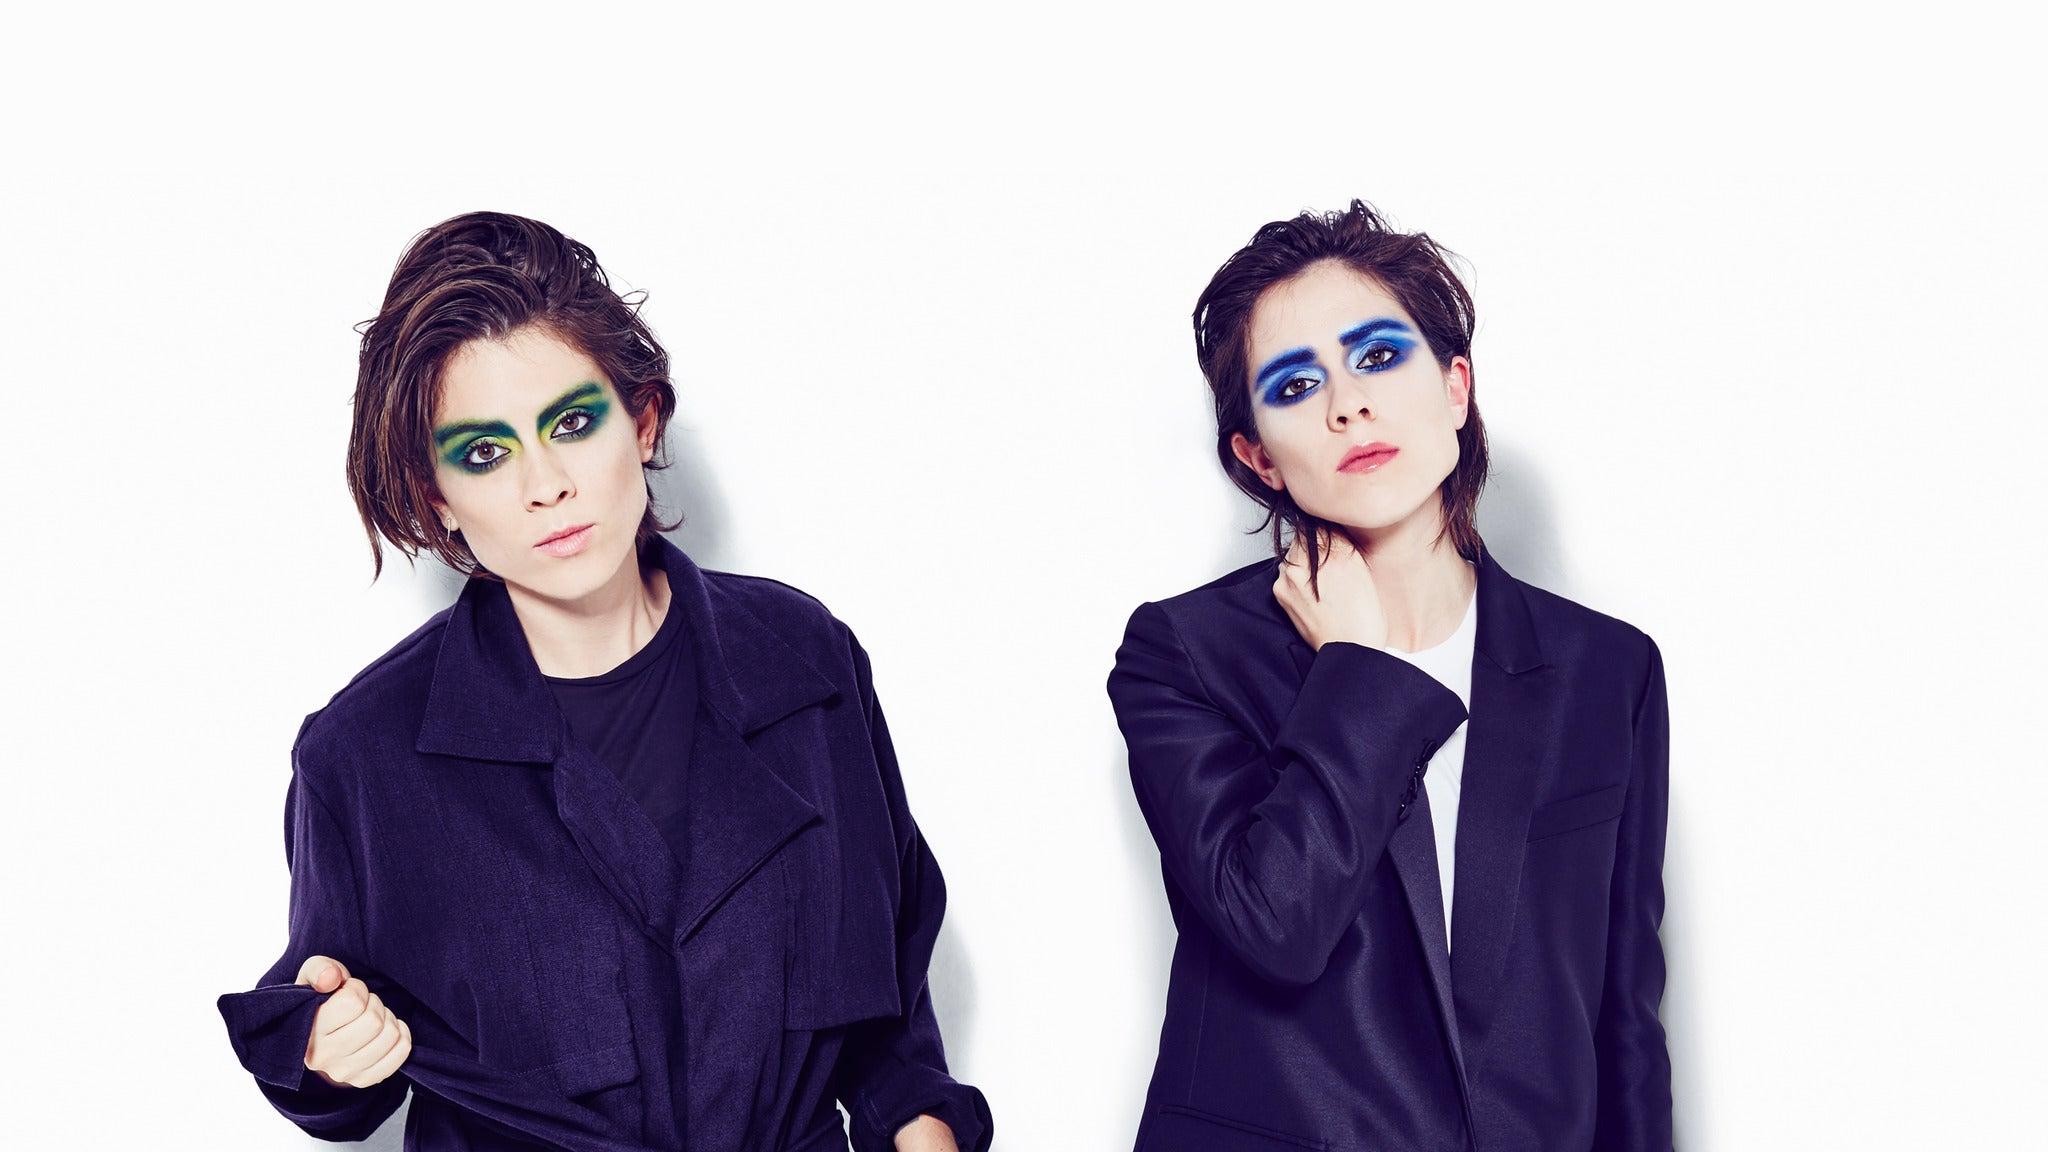 Tegan and Sara at The Tabernacle